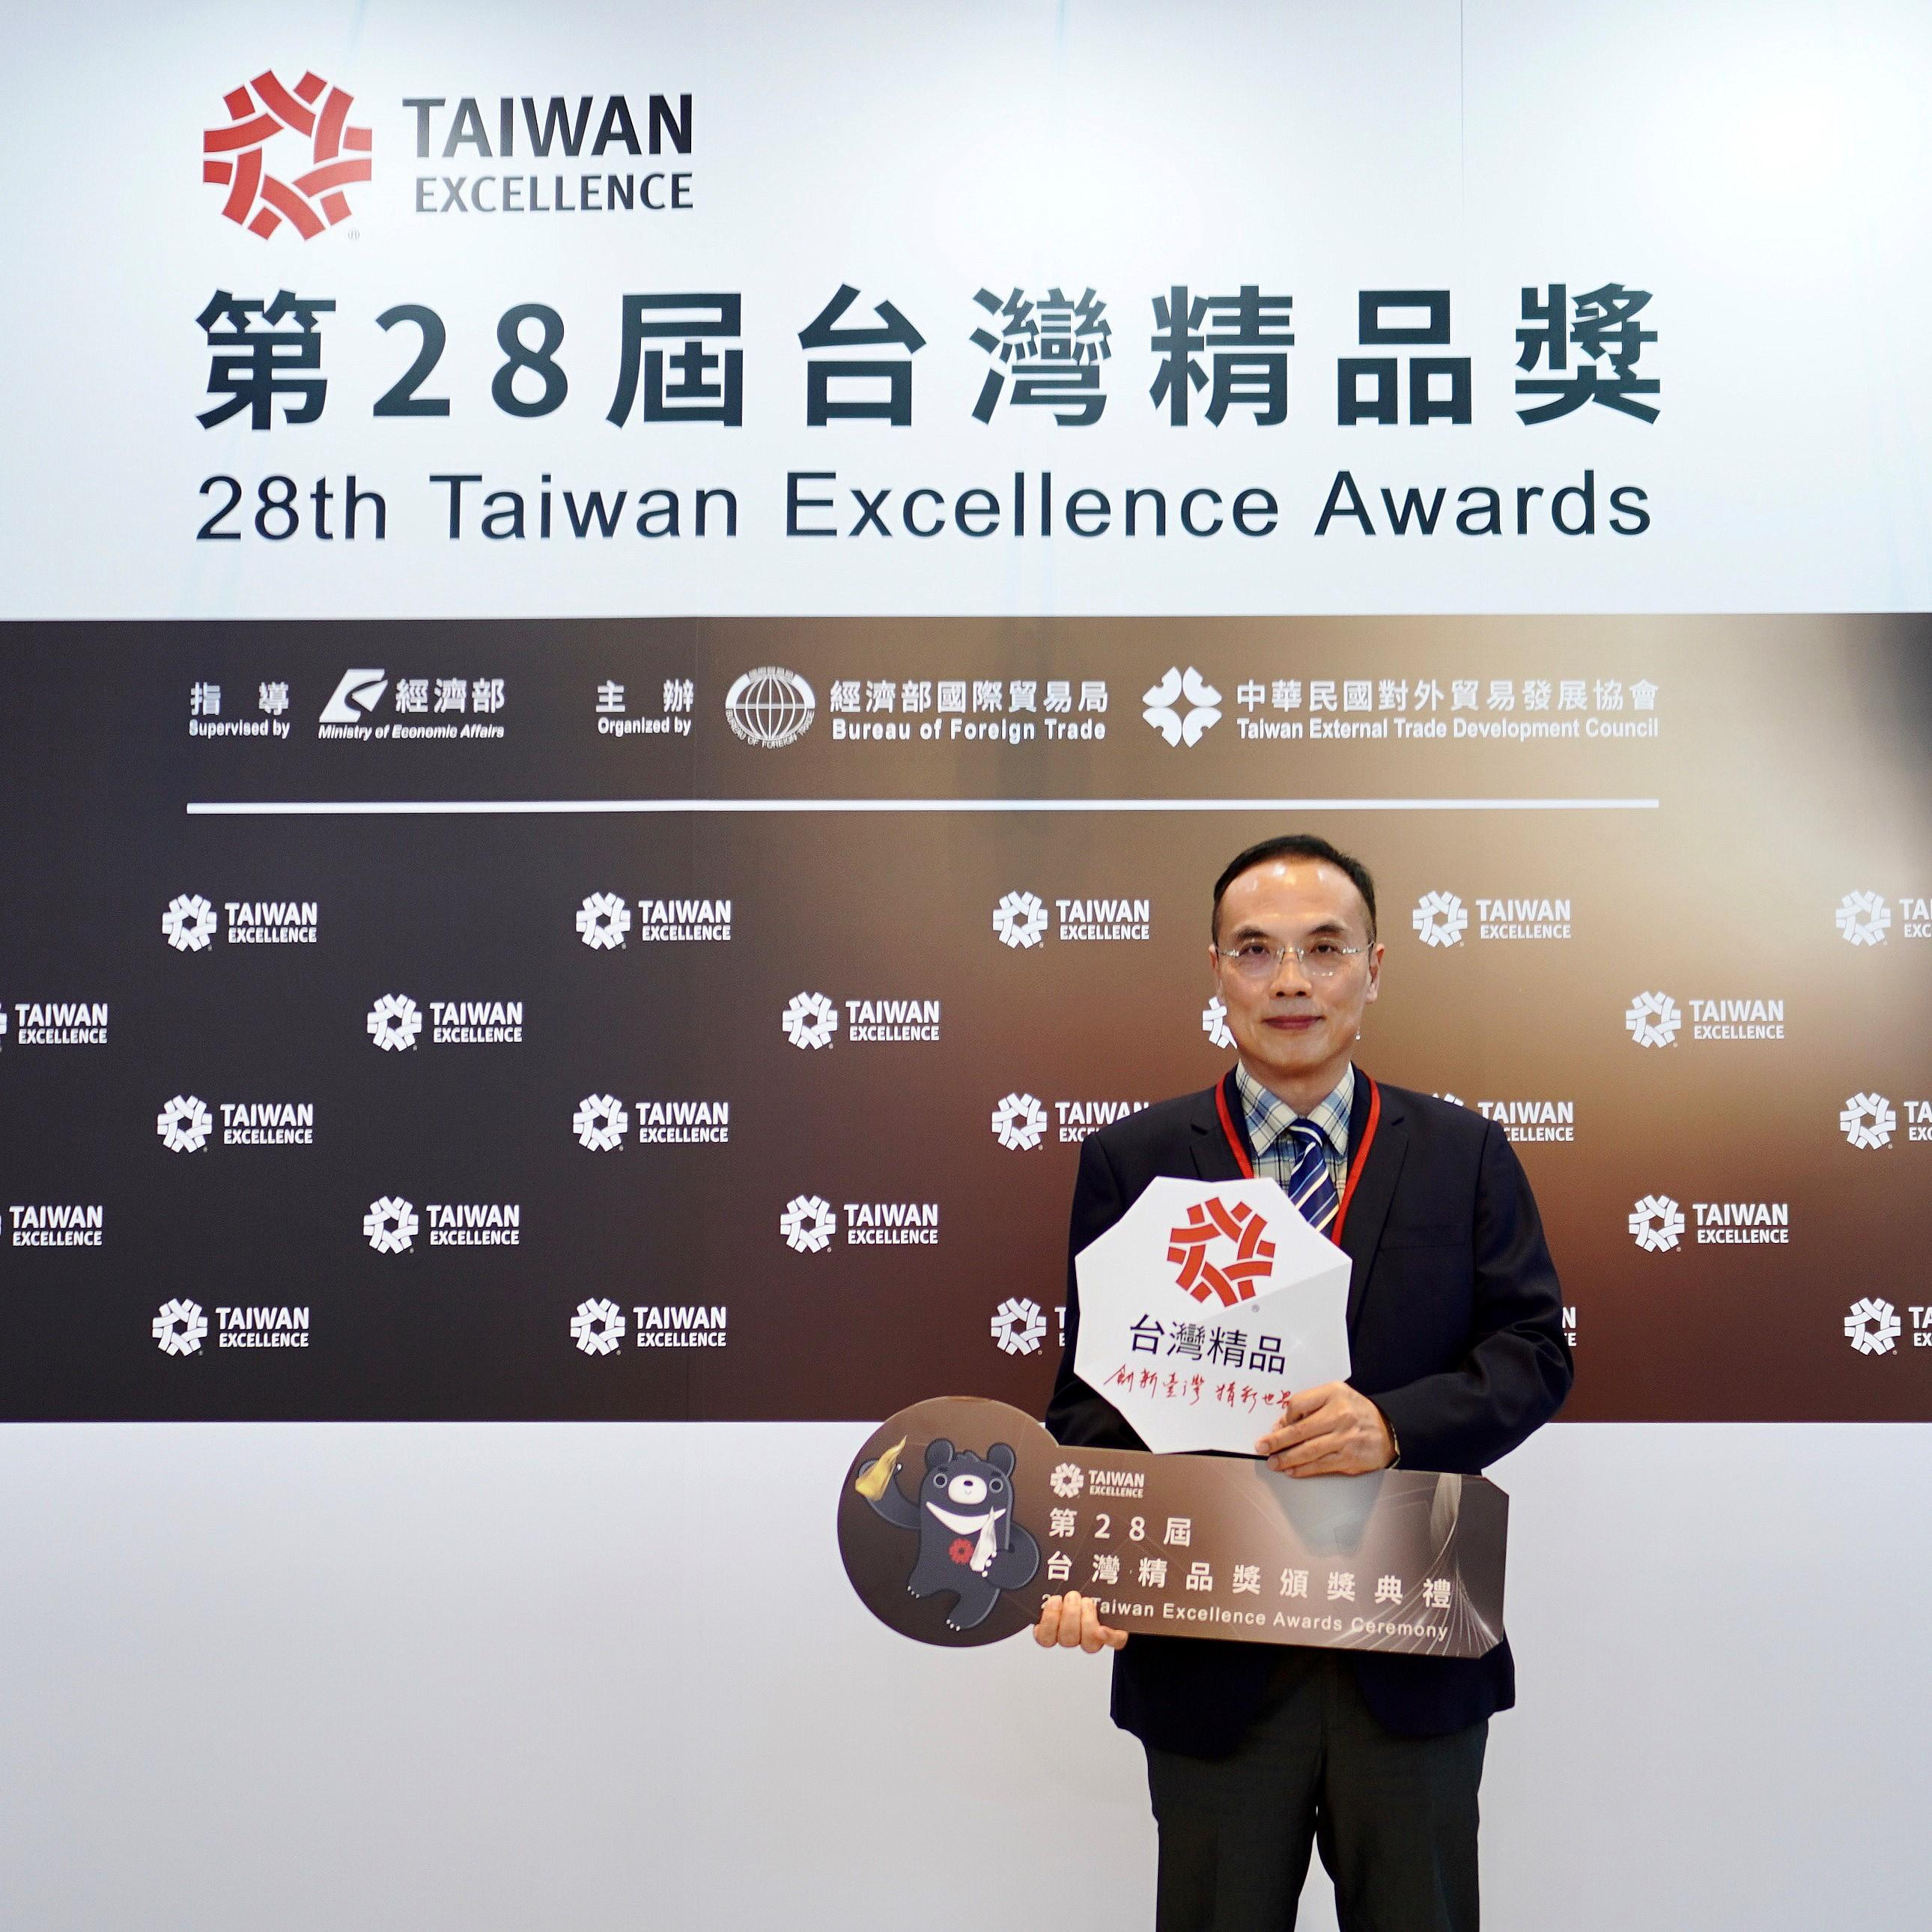 Silicon Power удостоена главной ИТ-награды вТайване Taiwan Excellence Award